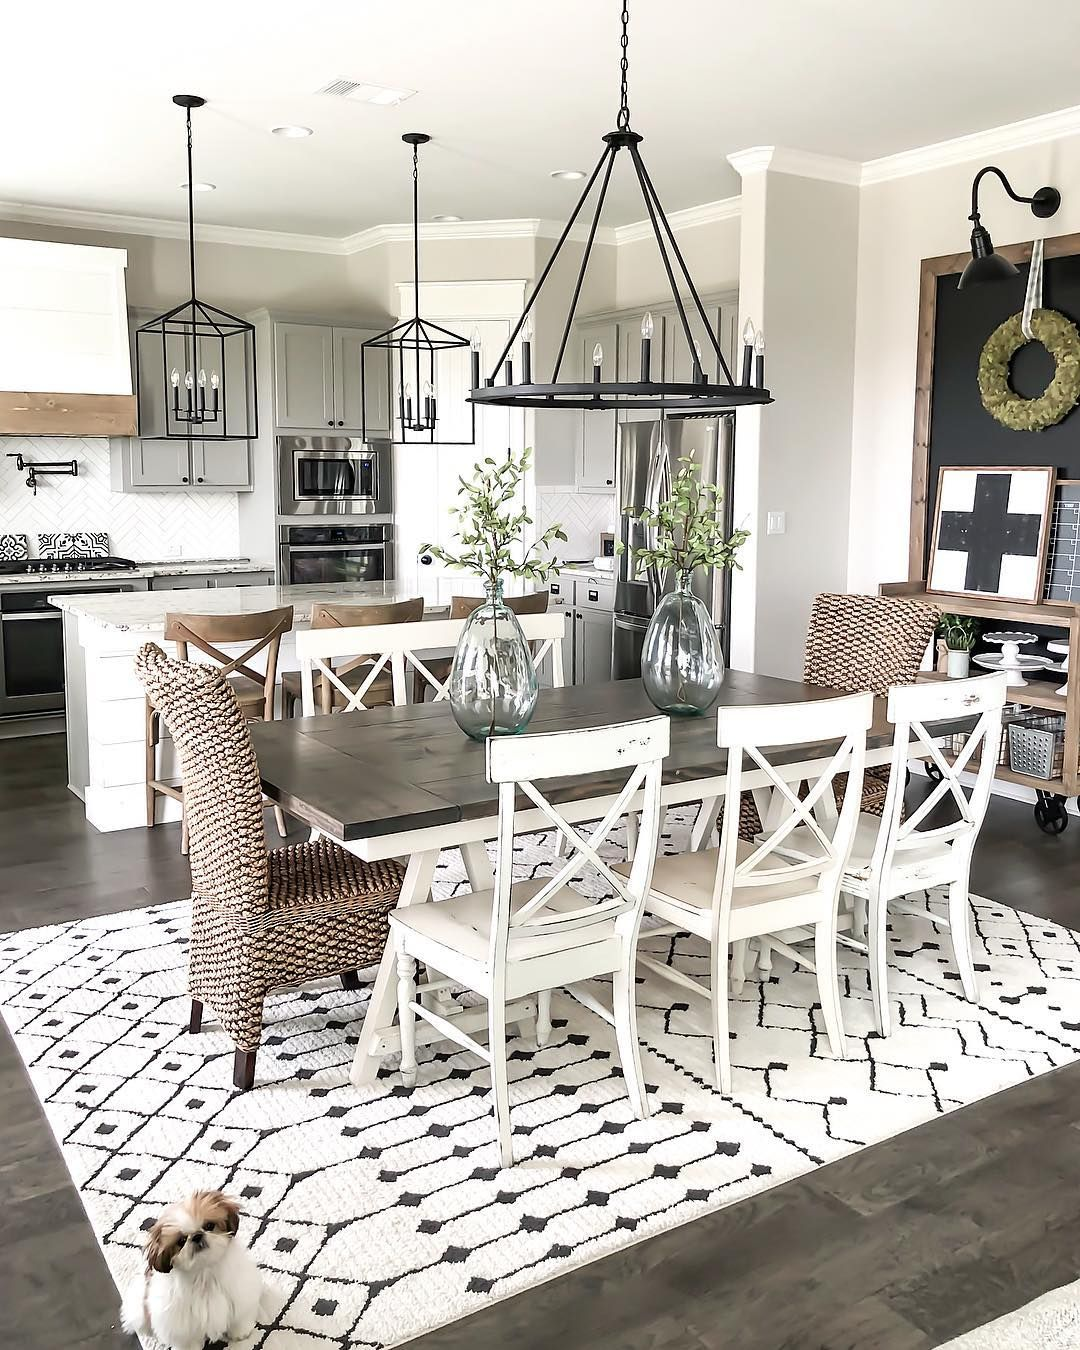 80 Modern Farmhouse Staircase Decor Ideas 64: 4,225 Likes, 80 Comments - Holly